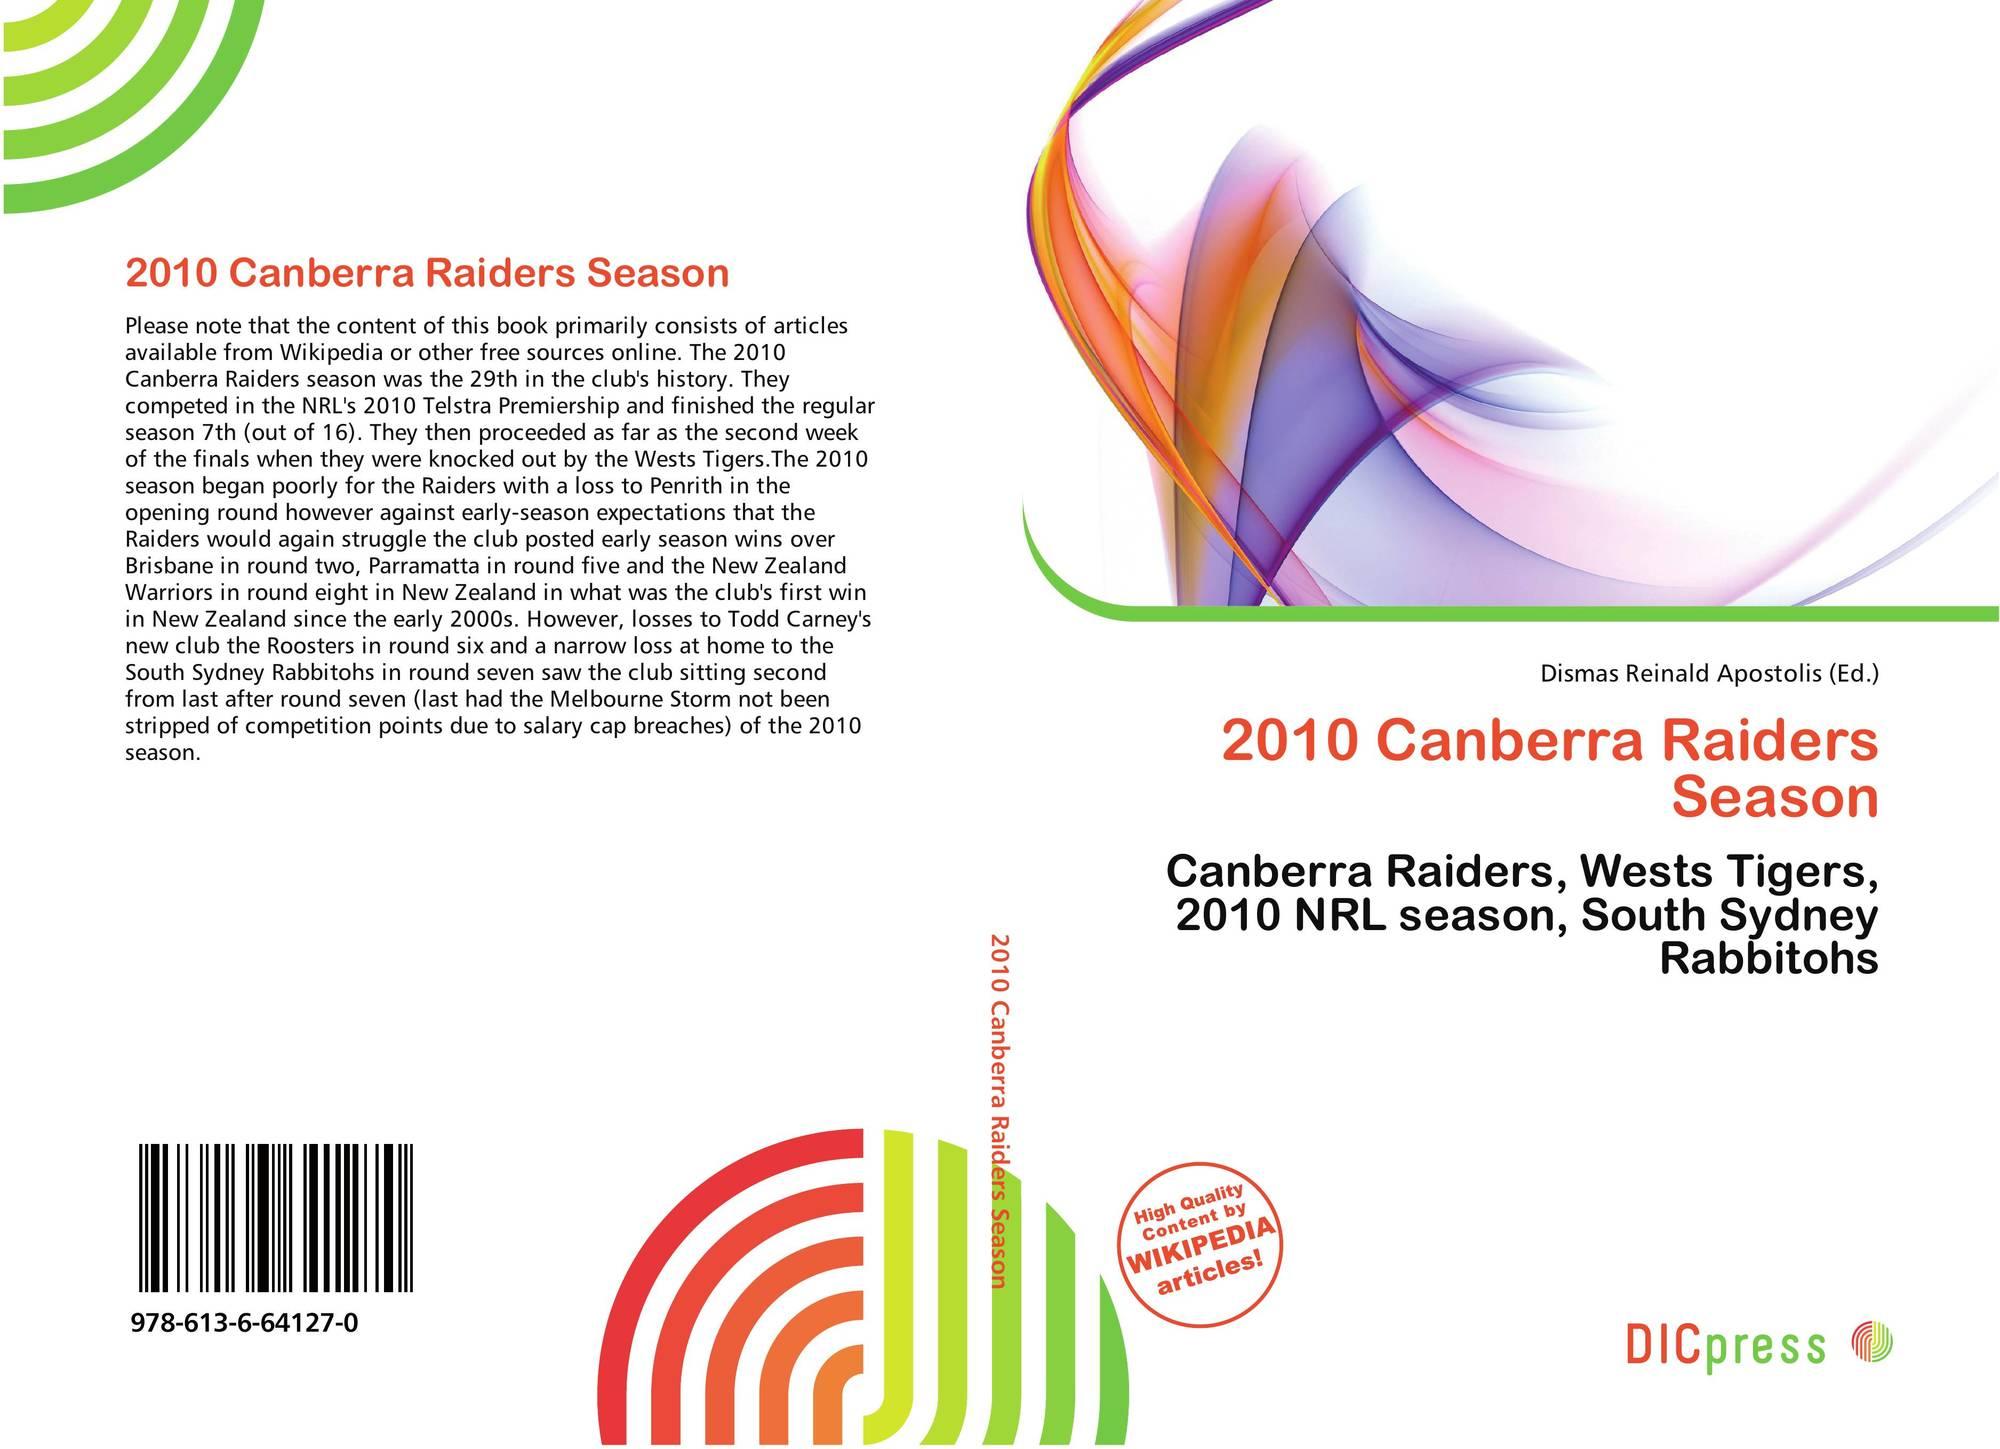 2010 Canberra Raiders Season 978 613 6 64127 0 6136641275 9786136641270